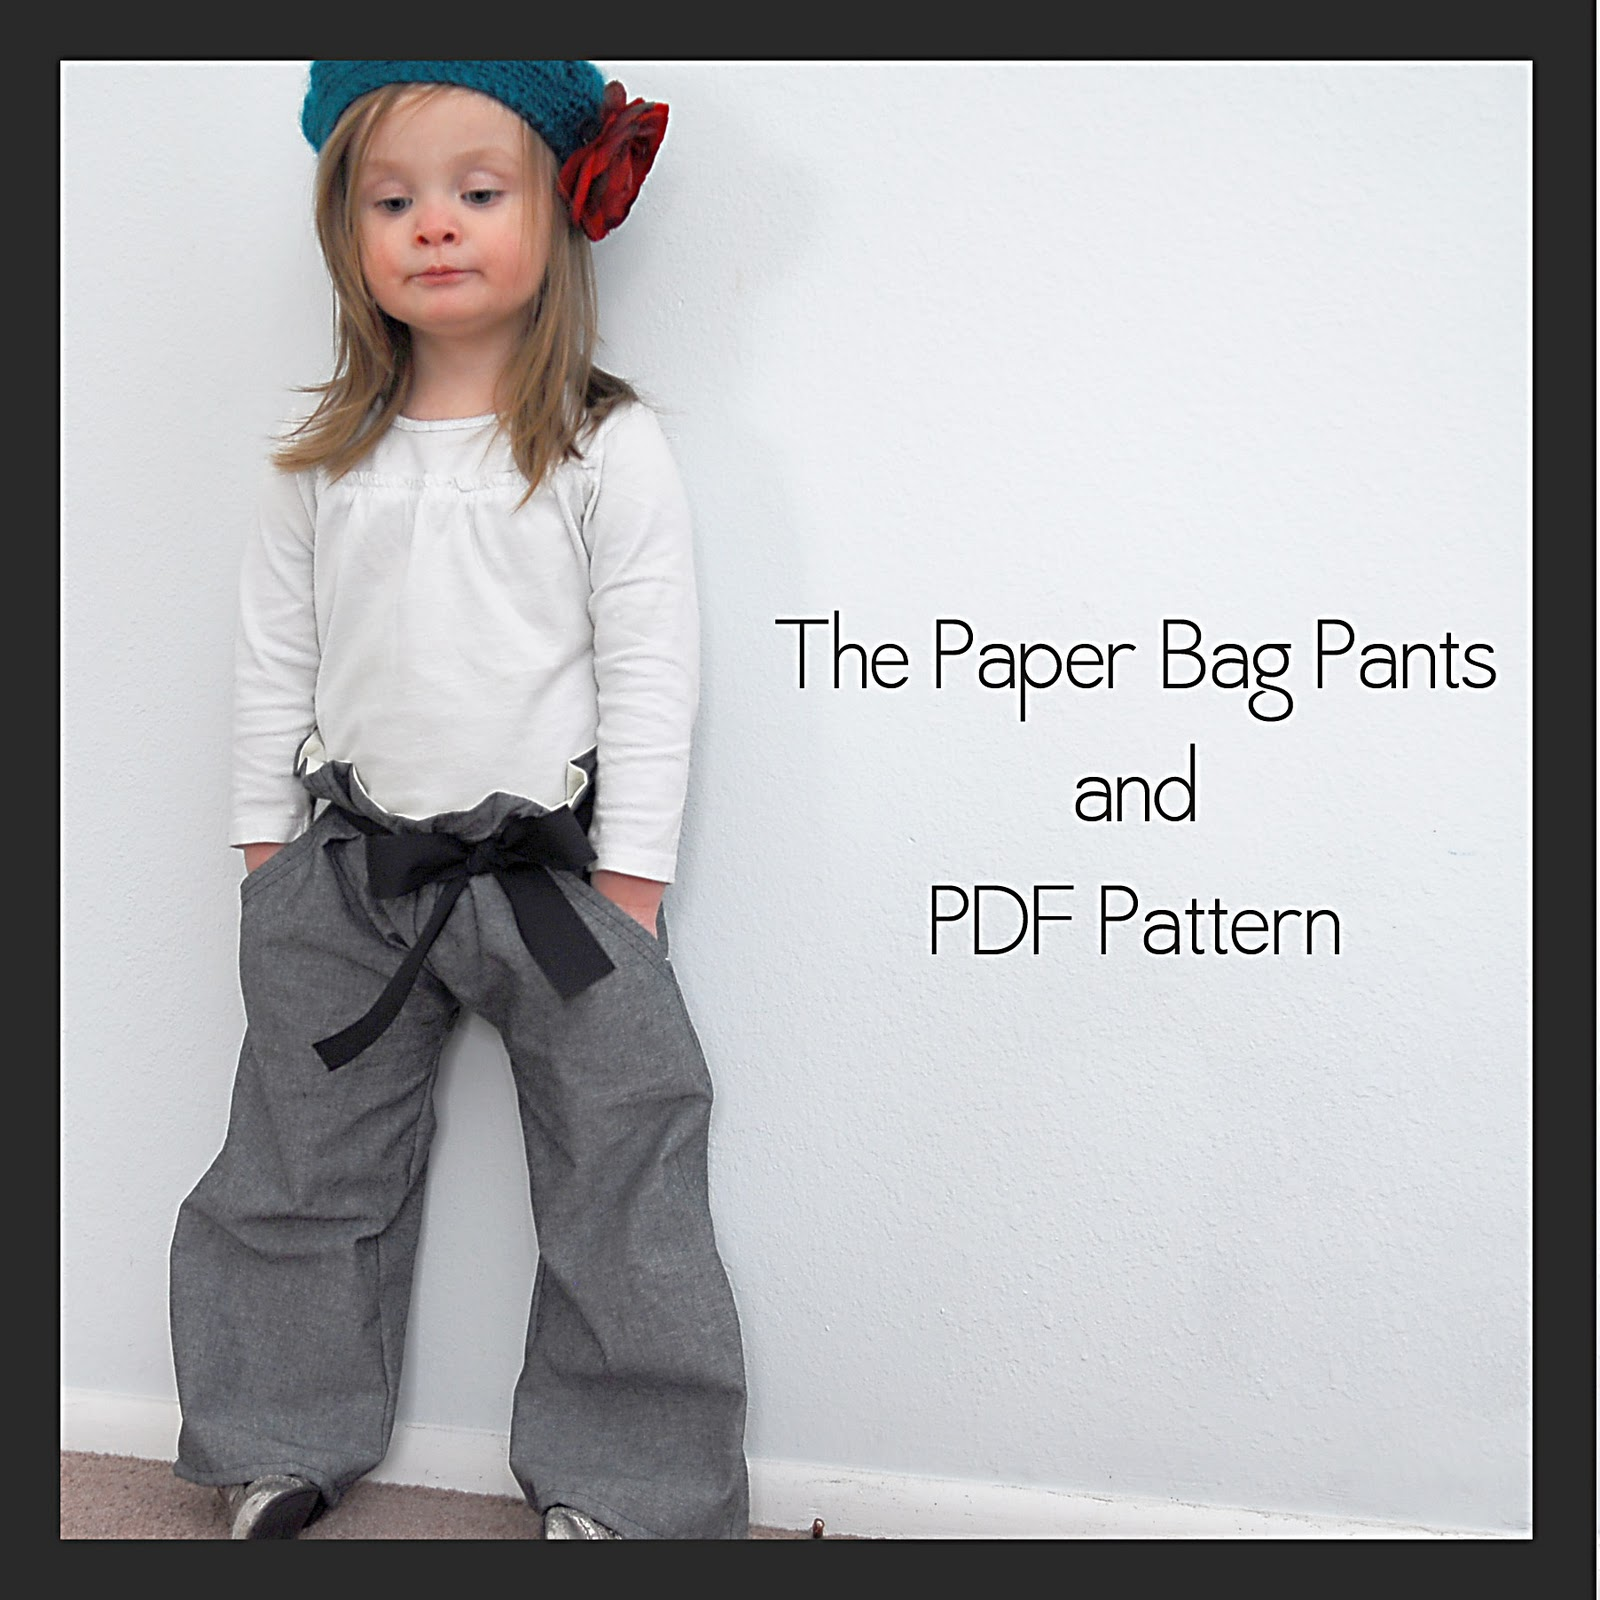 655bba120e99b Paper Bag Pants {Free PDF Pattern} - Shwin and Shwin